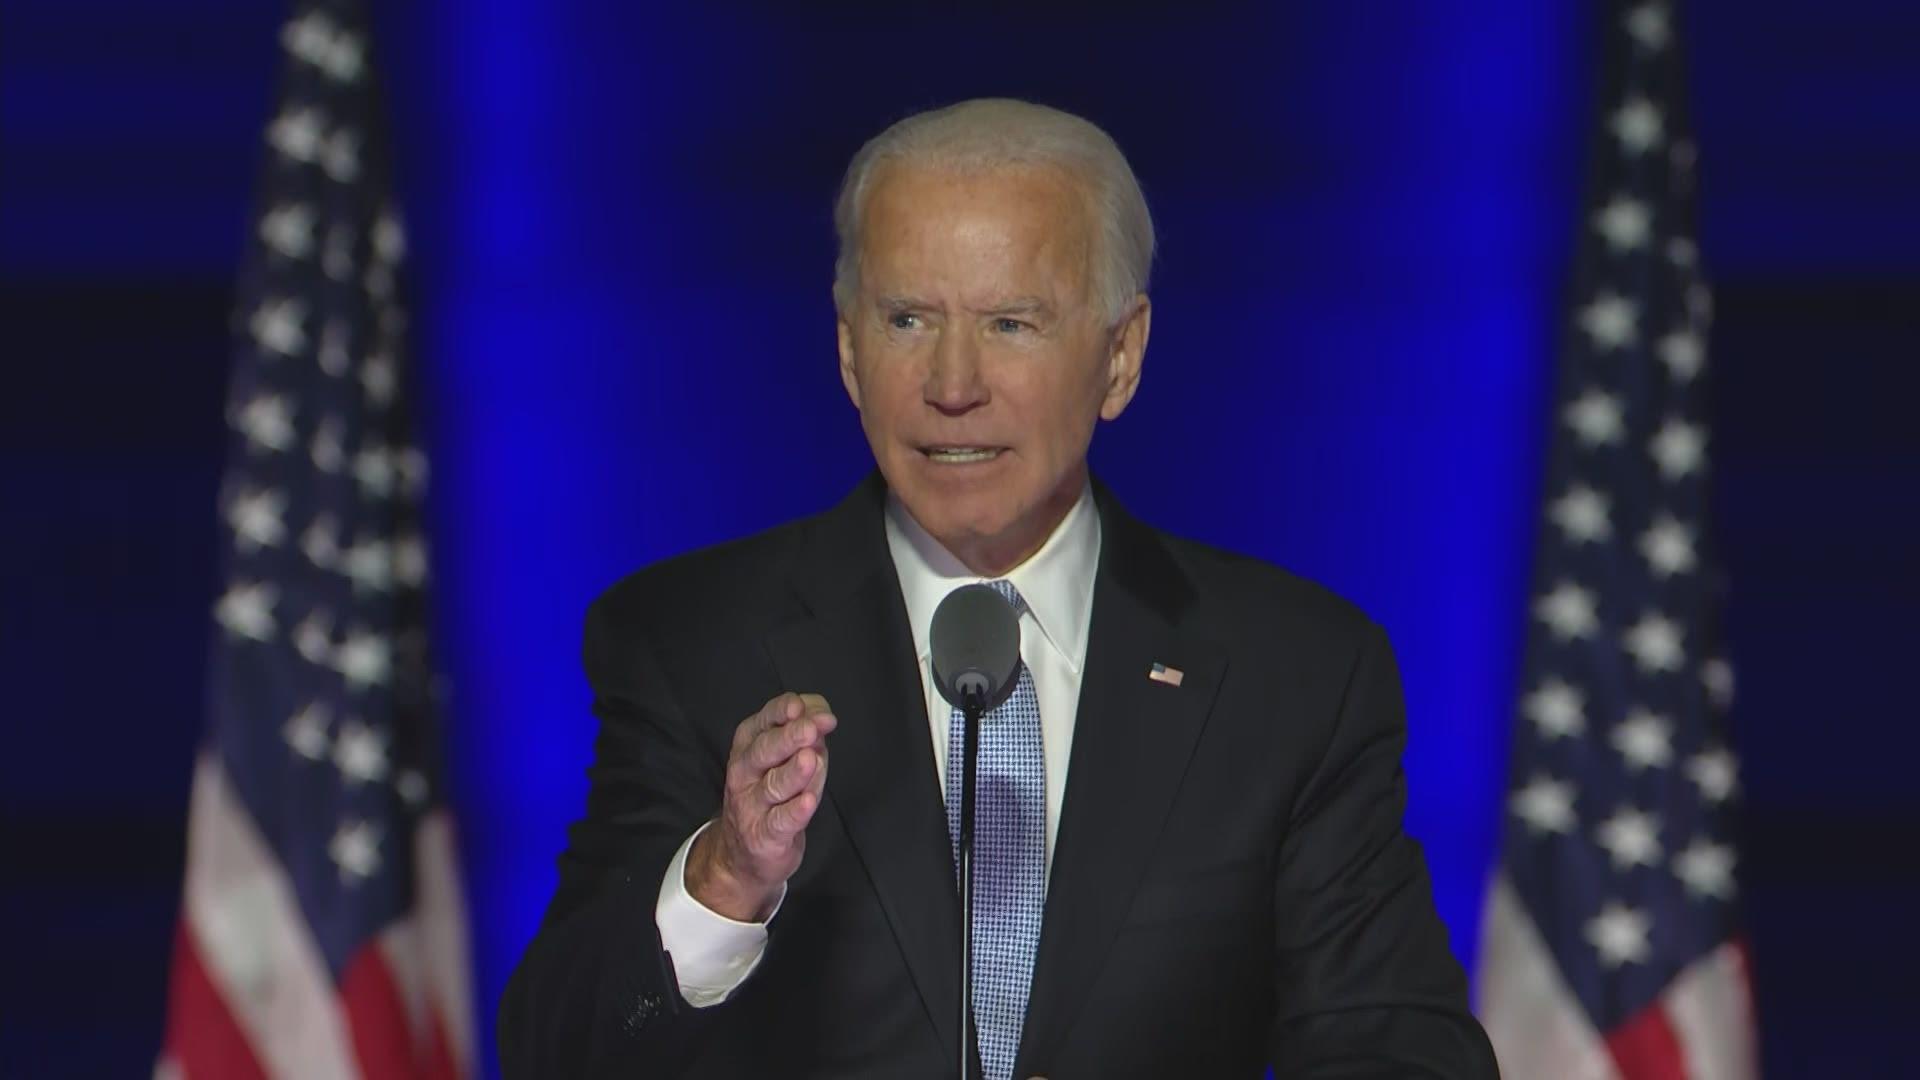 Rick Roberts: Should Walter Biden Be Removed Under The 25th Amendment?